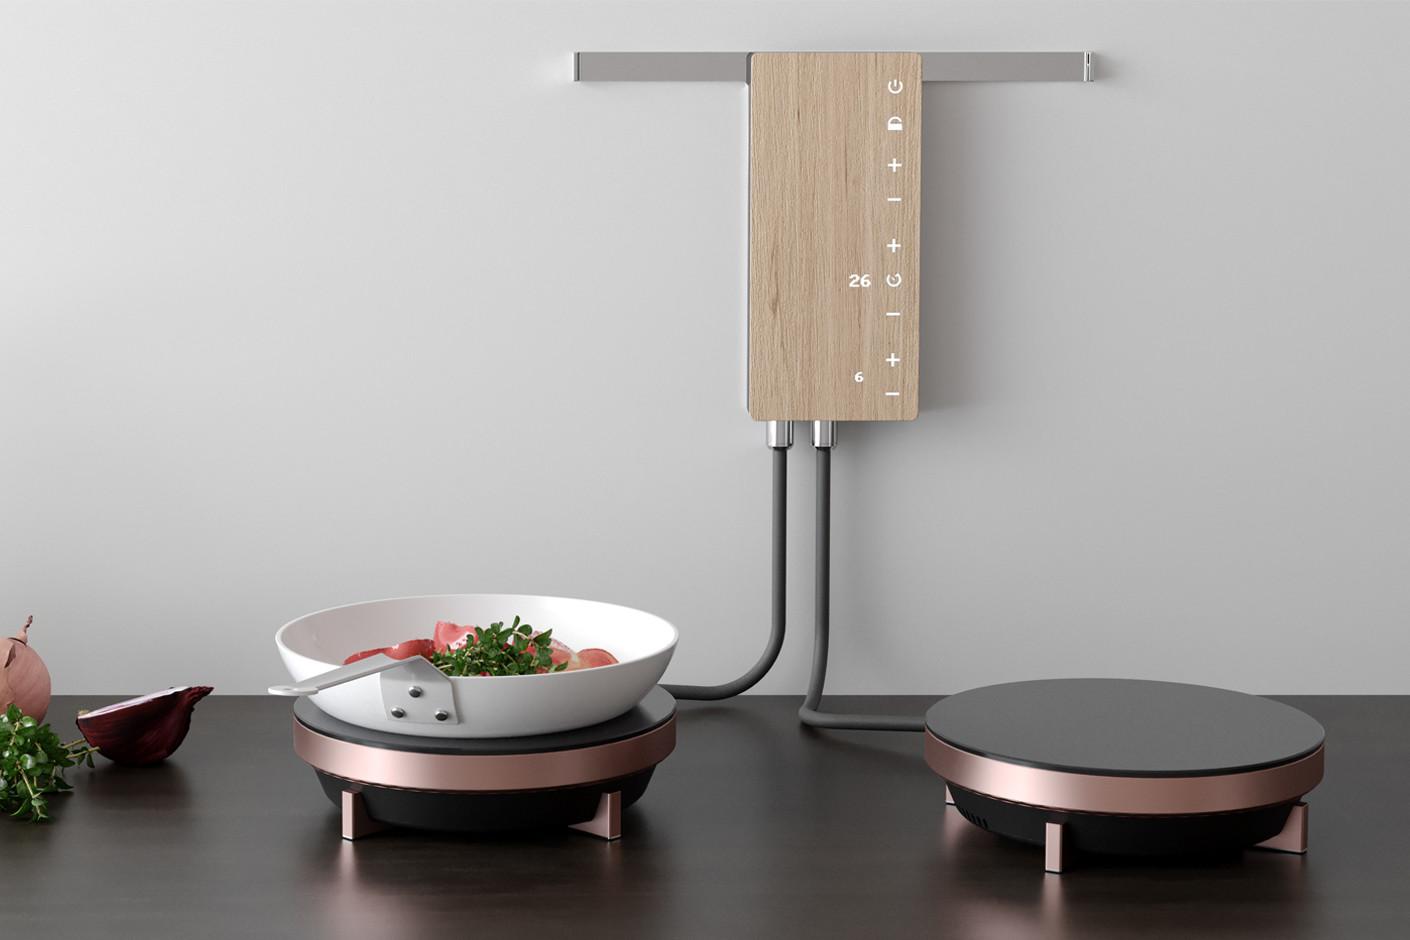 dapur minimalis dengan peralatan dapur kompor listrik mini